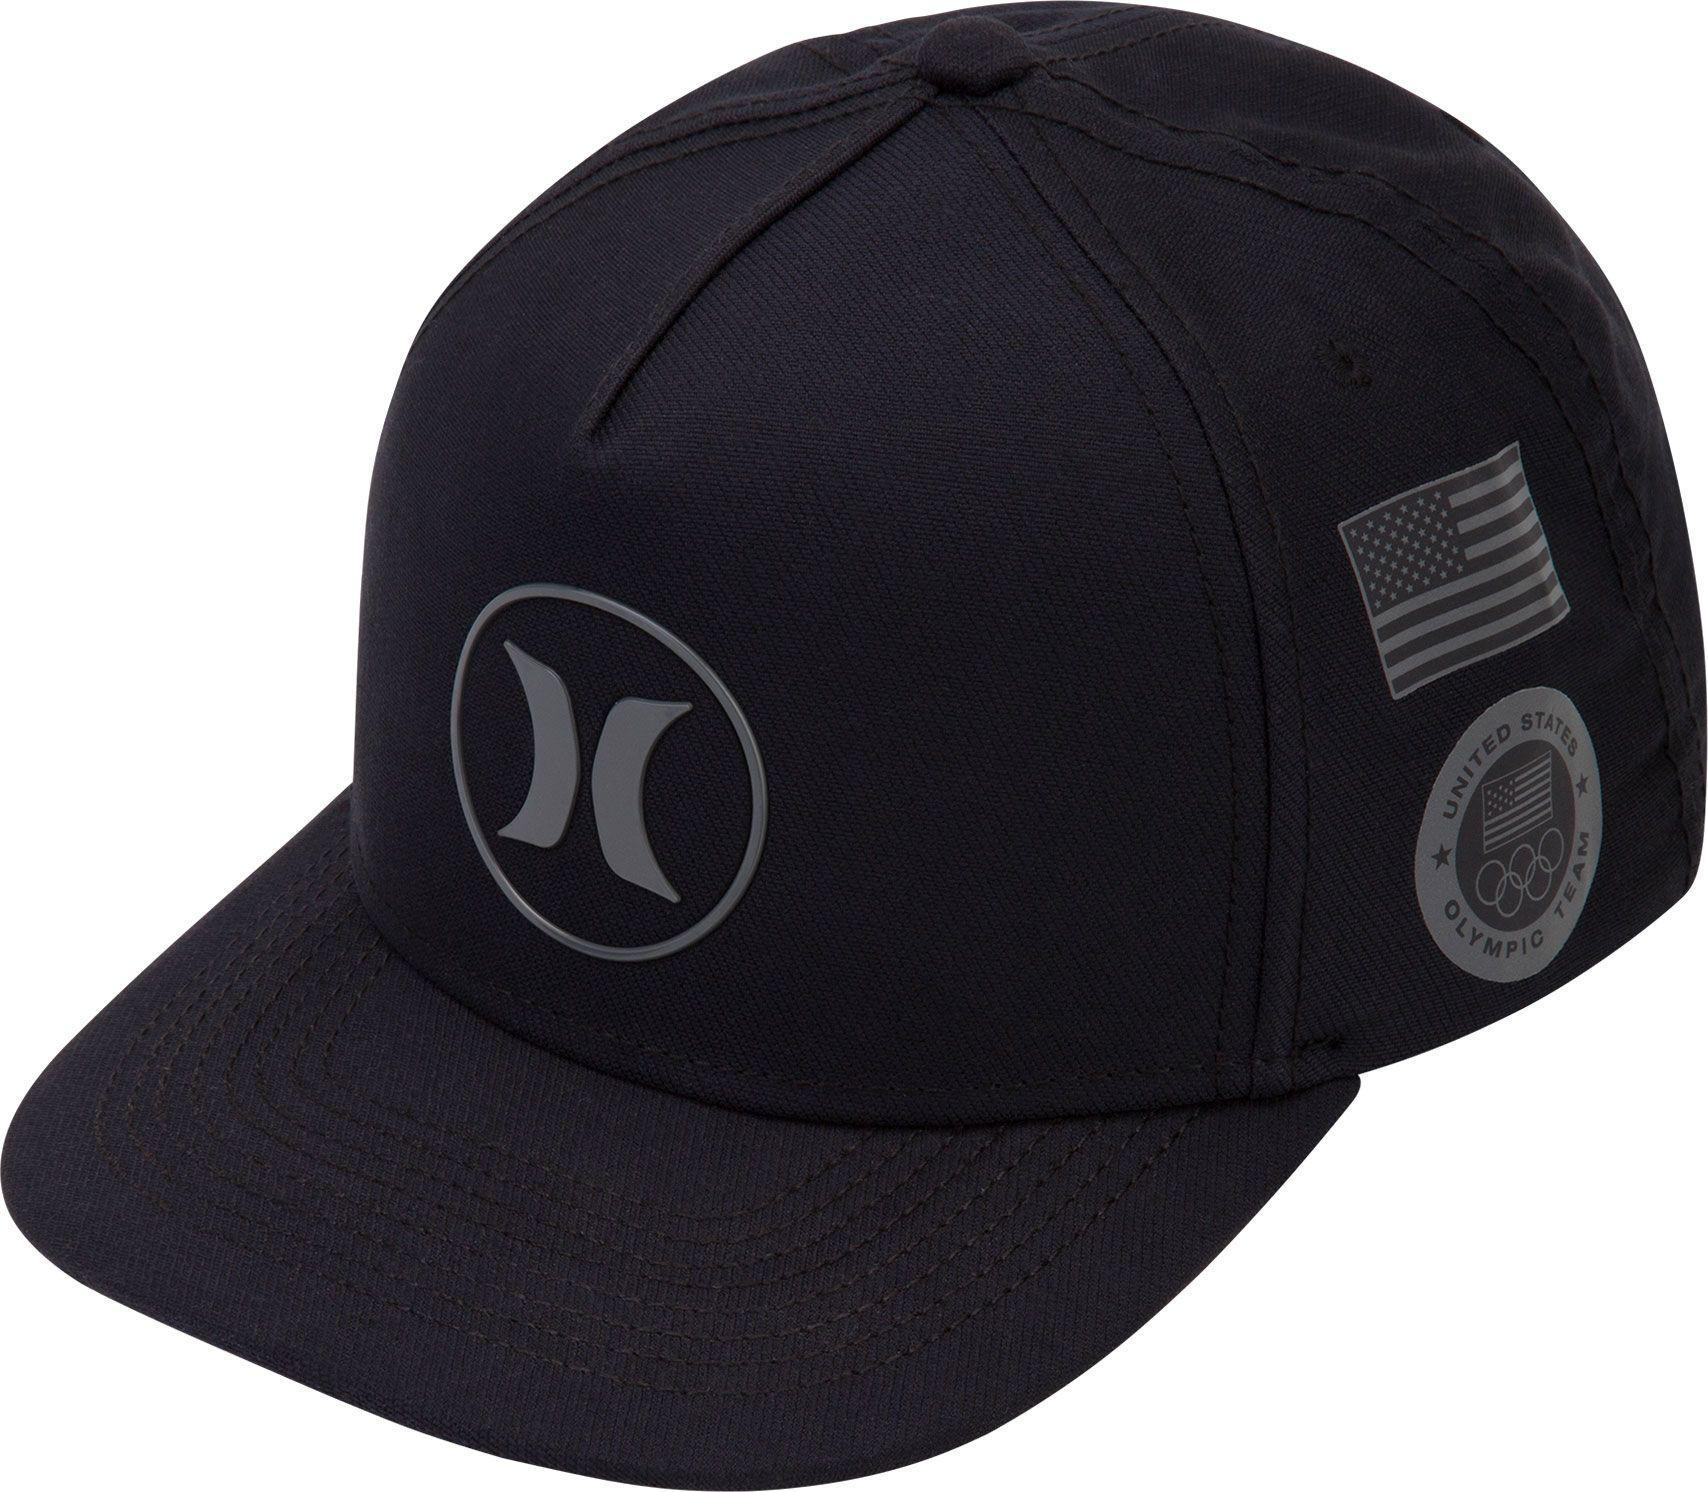 info for 56dfc ac8b0 Hurley Dri-fit Us Team Snapback Trucker Hat in Black for Men - Lyst